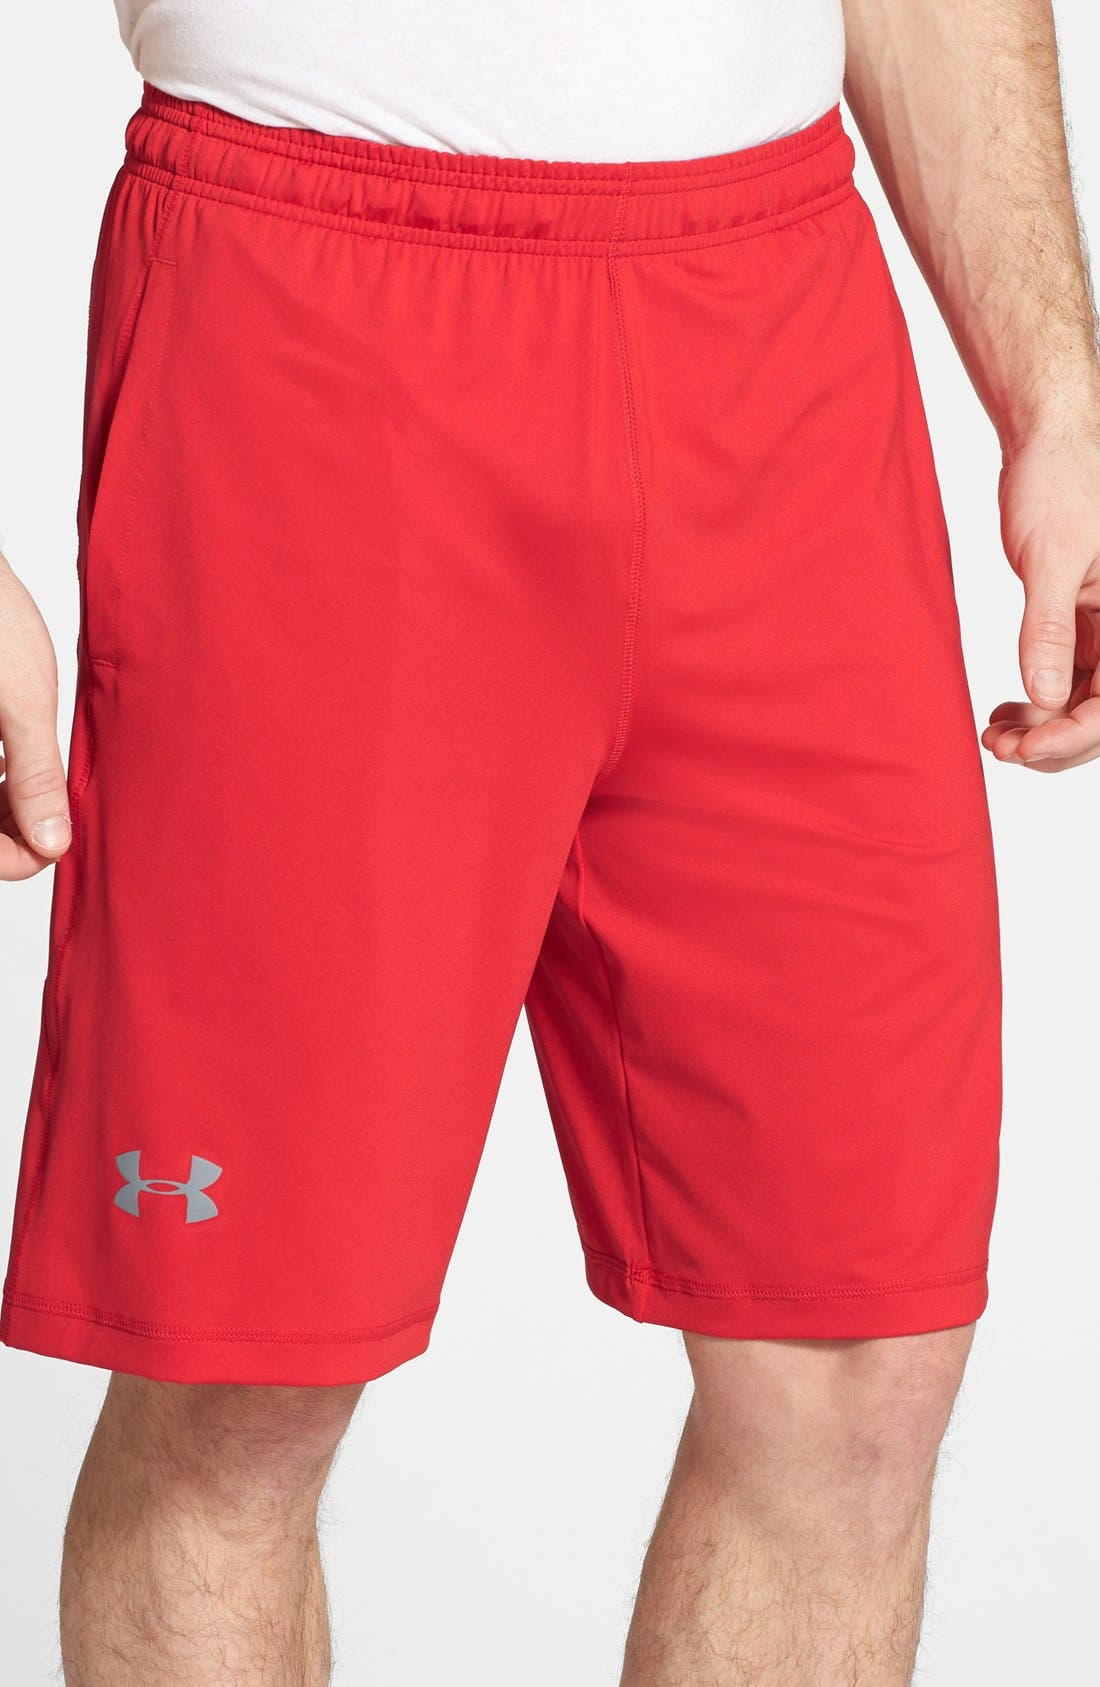 UNDER ARMOUR 'Raid' HeatGear® Loose-Fit Athletic Shorts